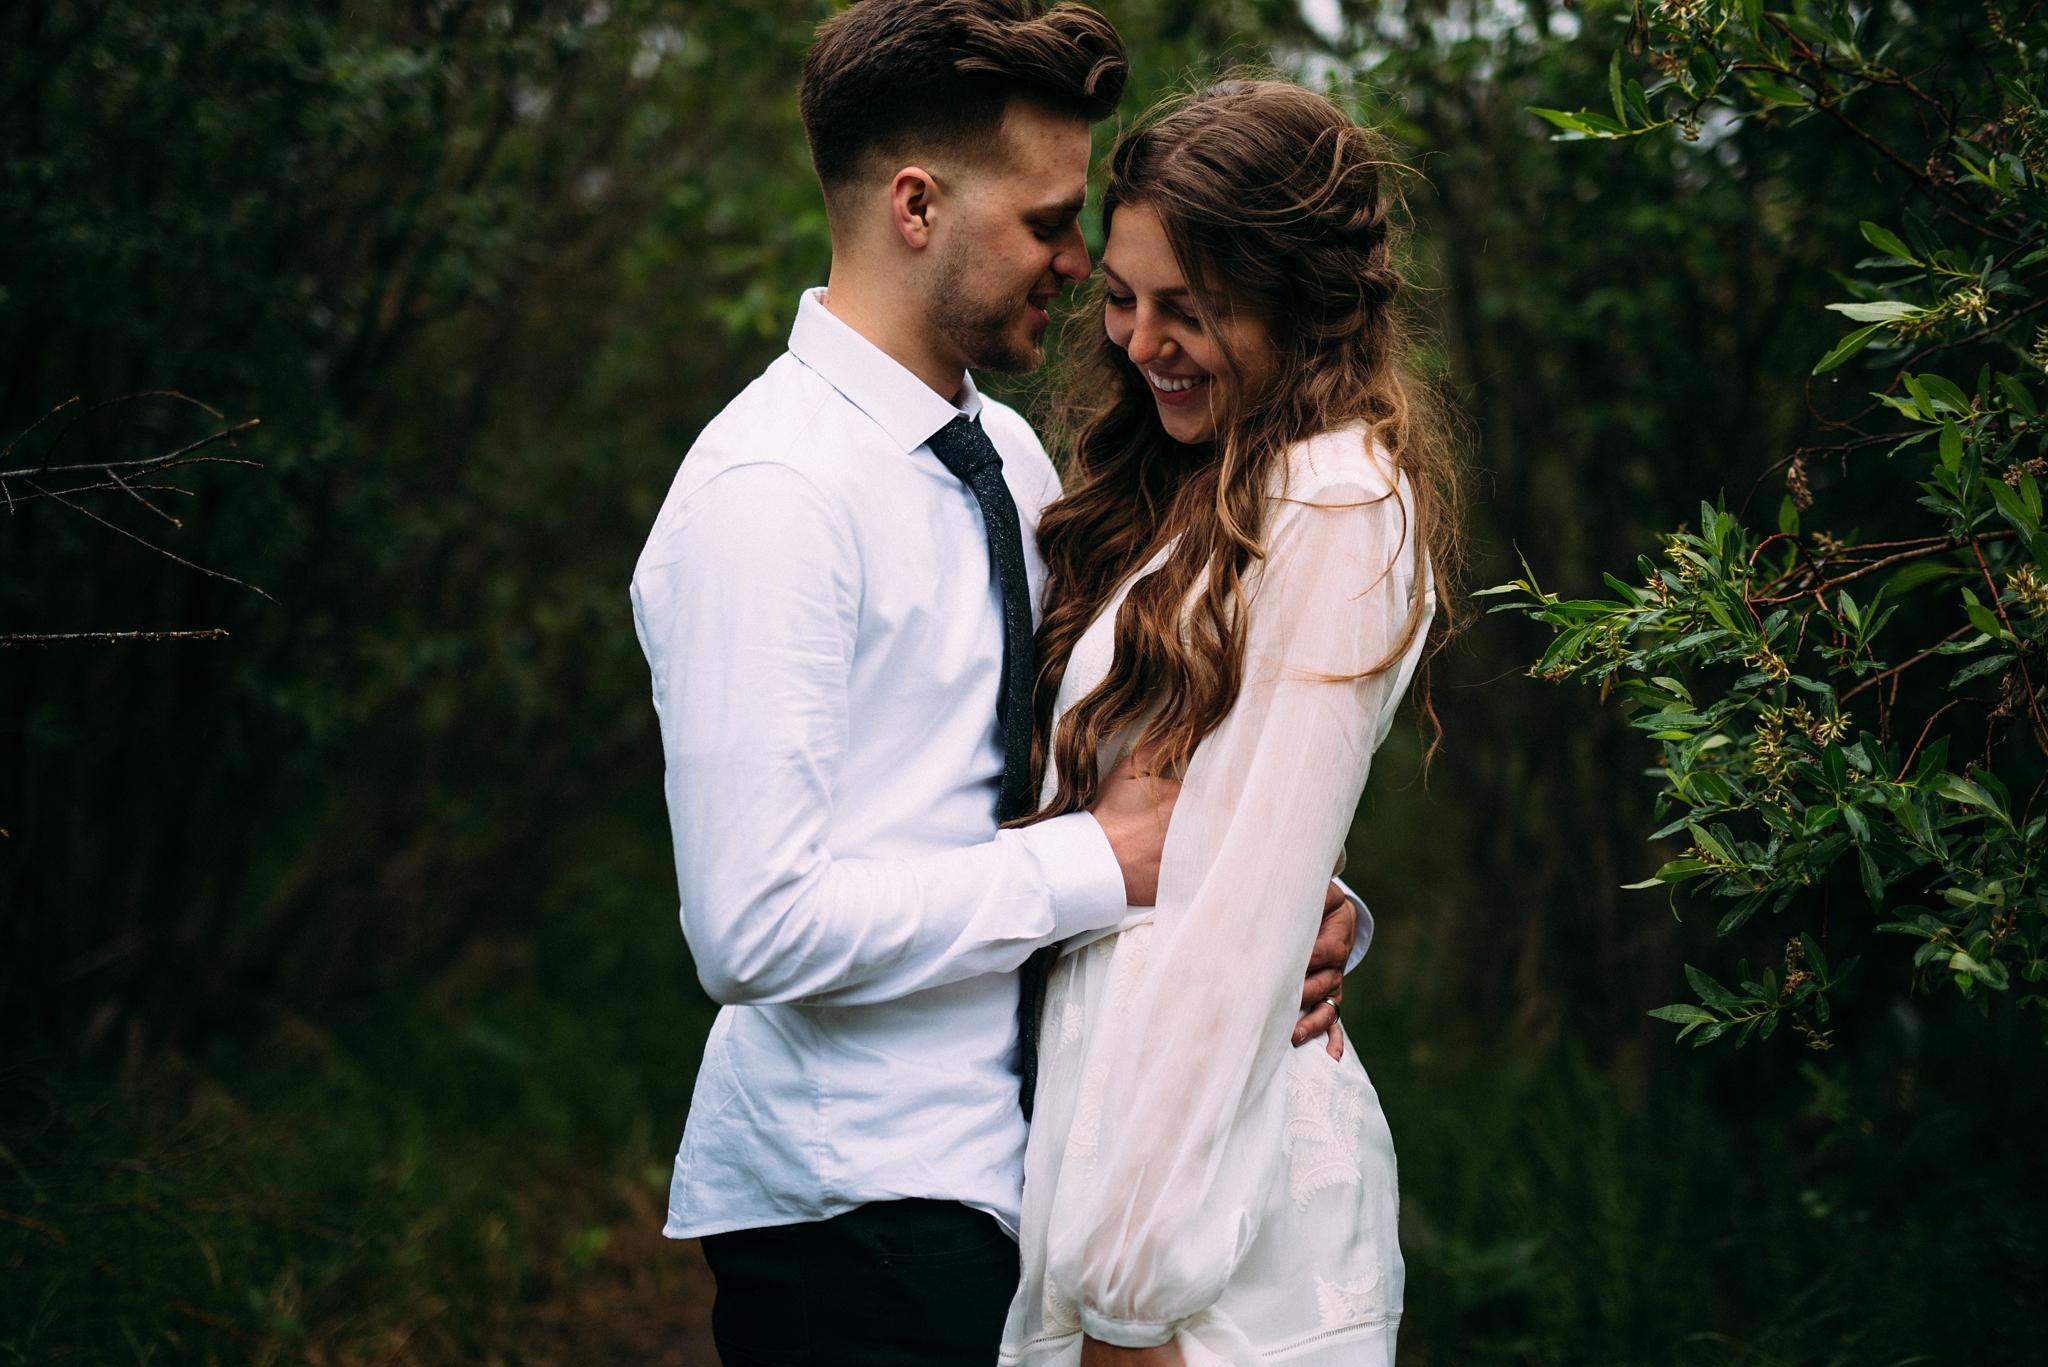 kaihla_tonai_intimate_wedding_elopement_photographer_4133